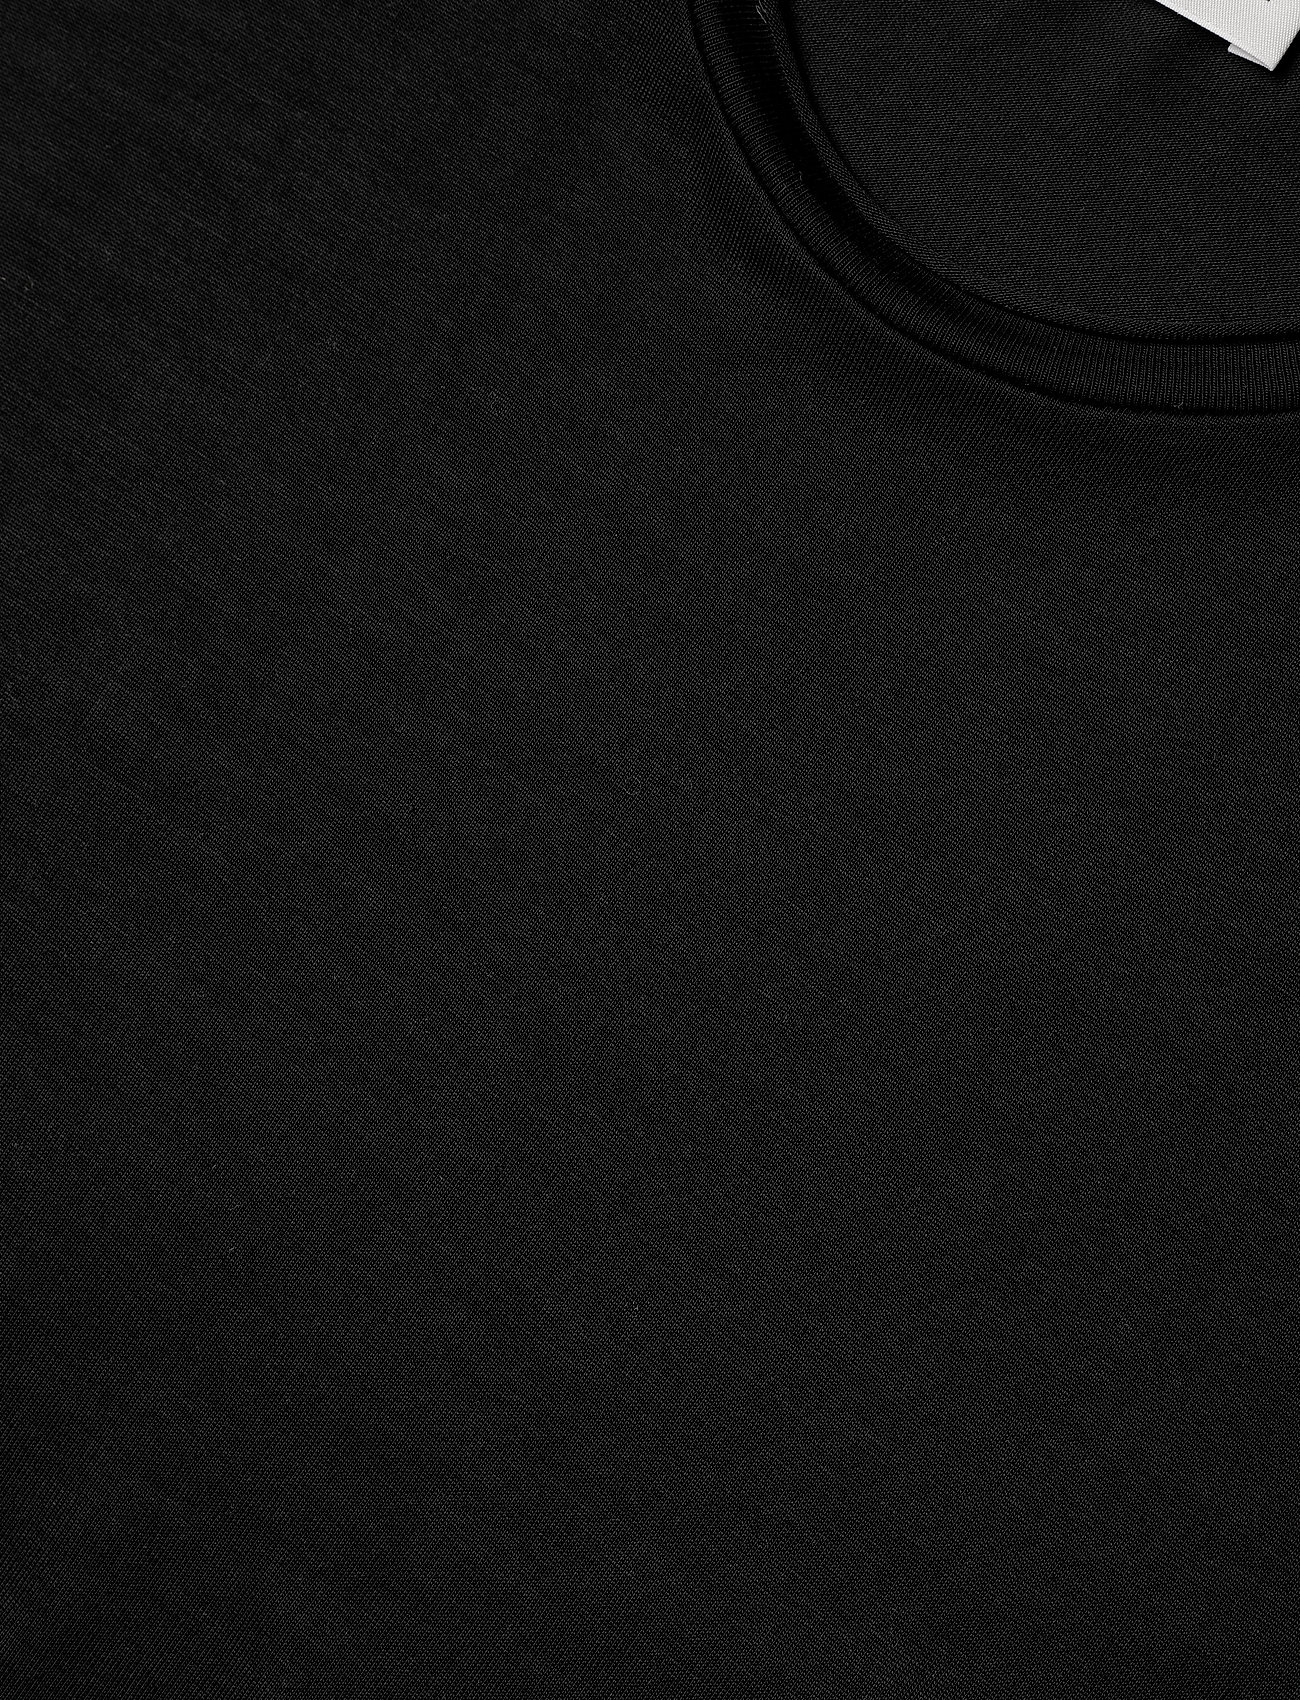 Chalett (Black) (1499.25 kr) - By Malene Birger